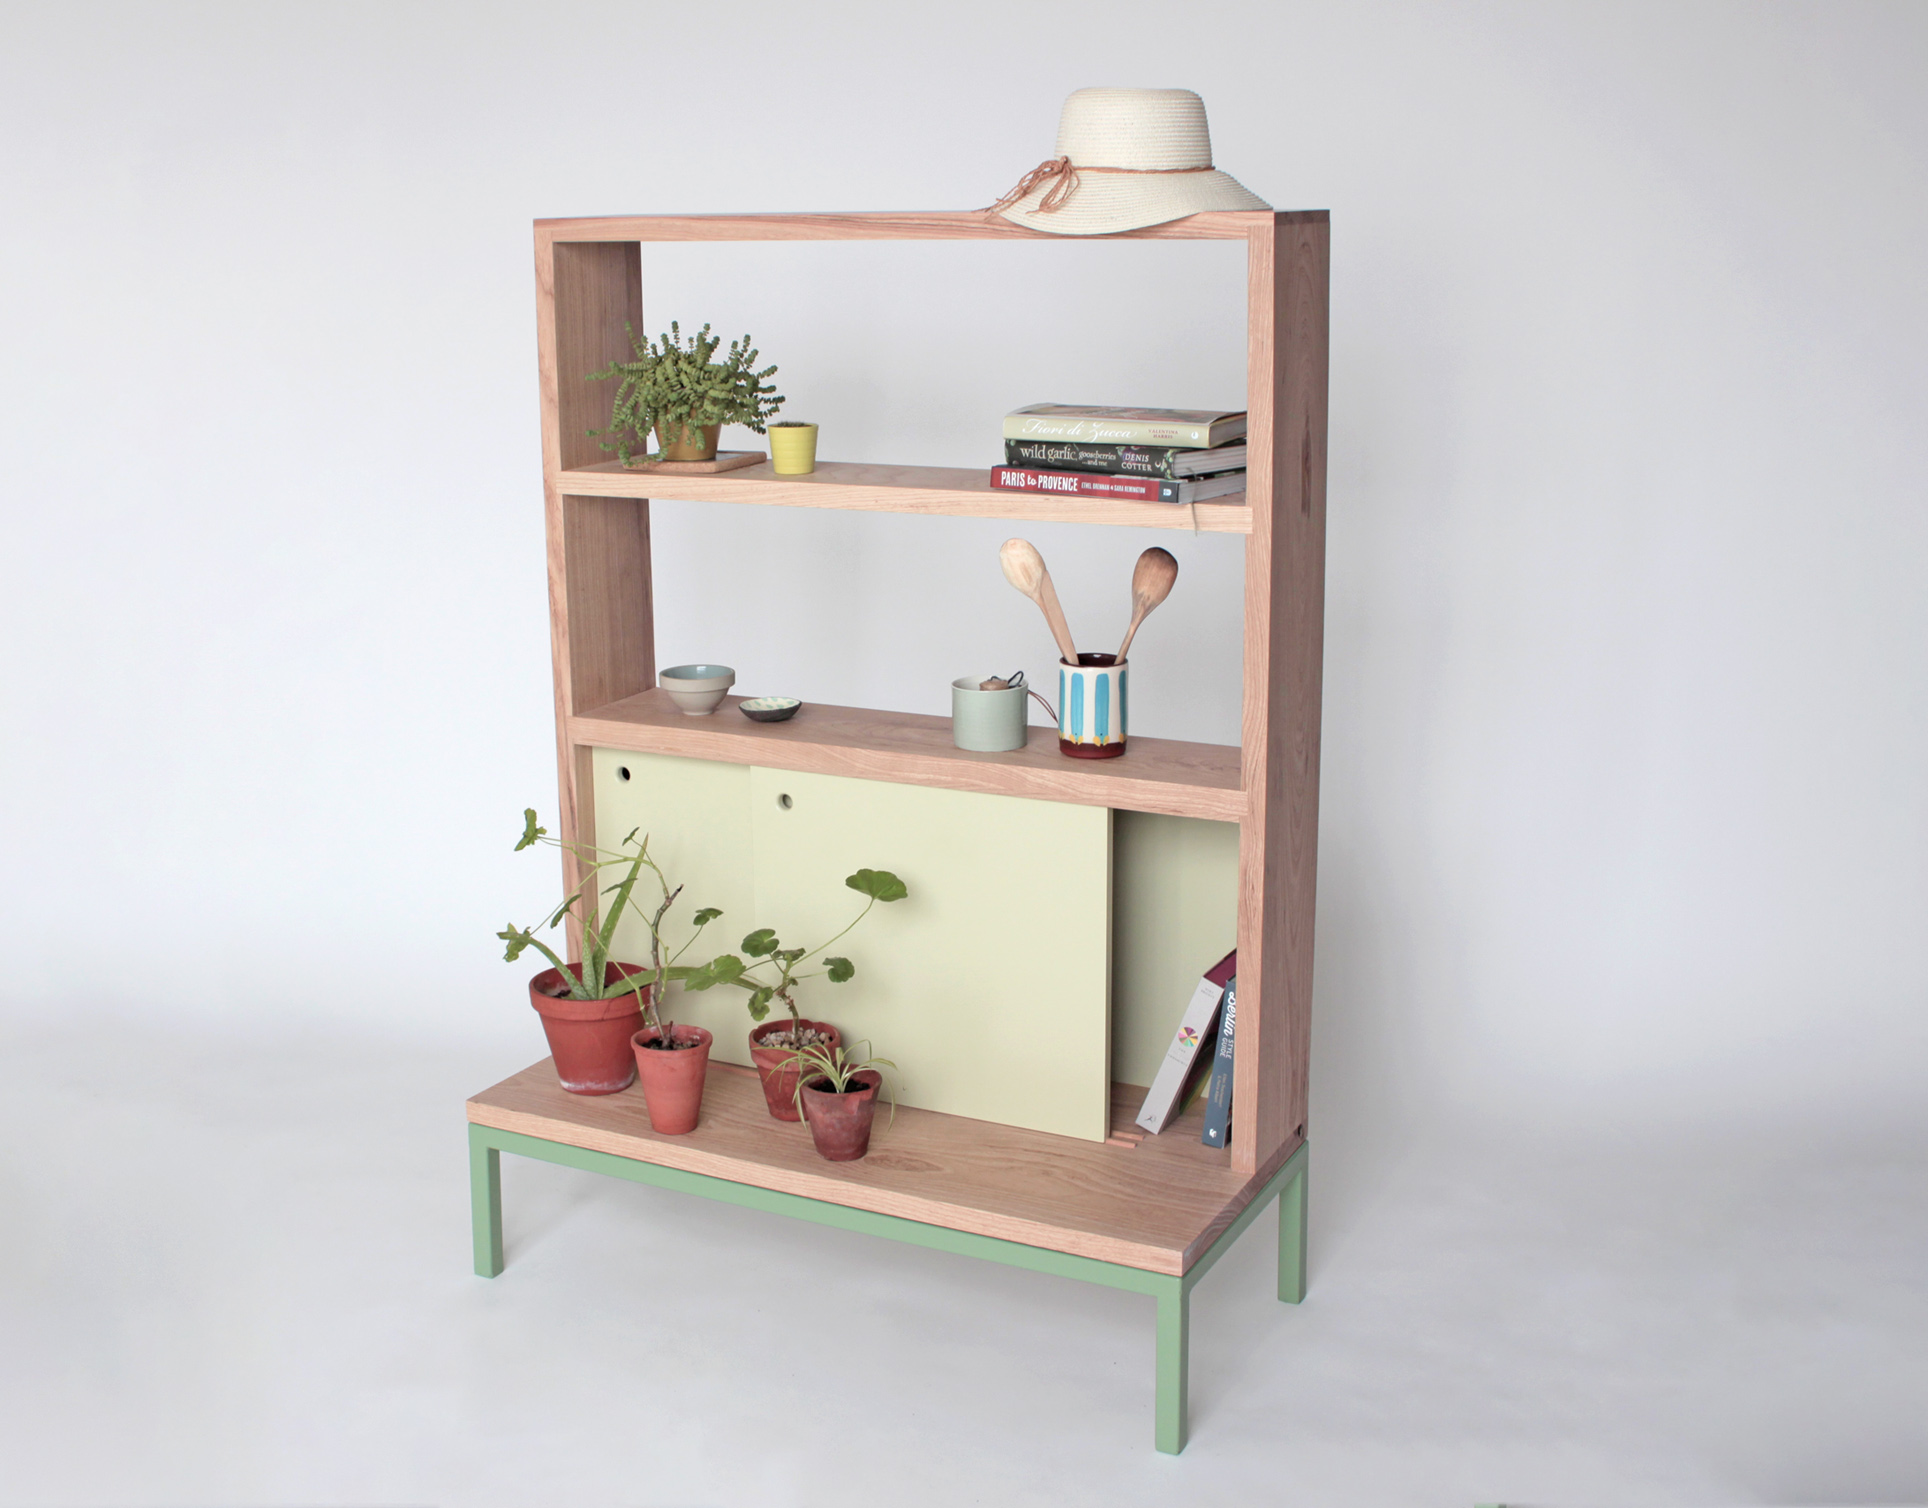 Planters-Dresser-Tricia-Harris-Designs.jpg